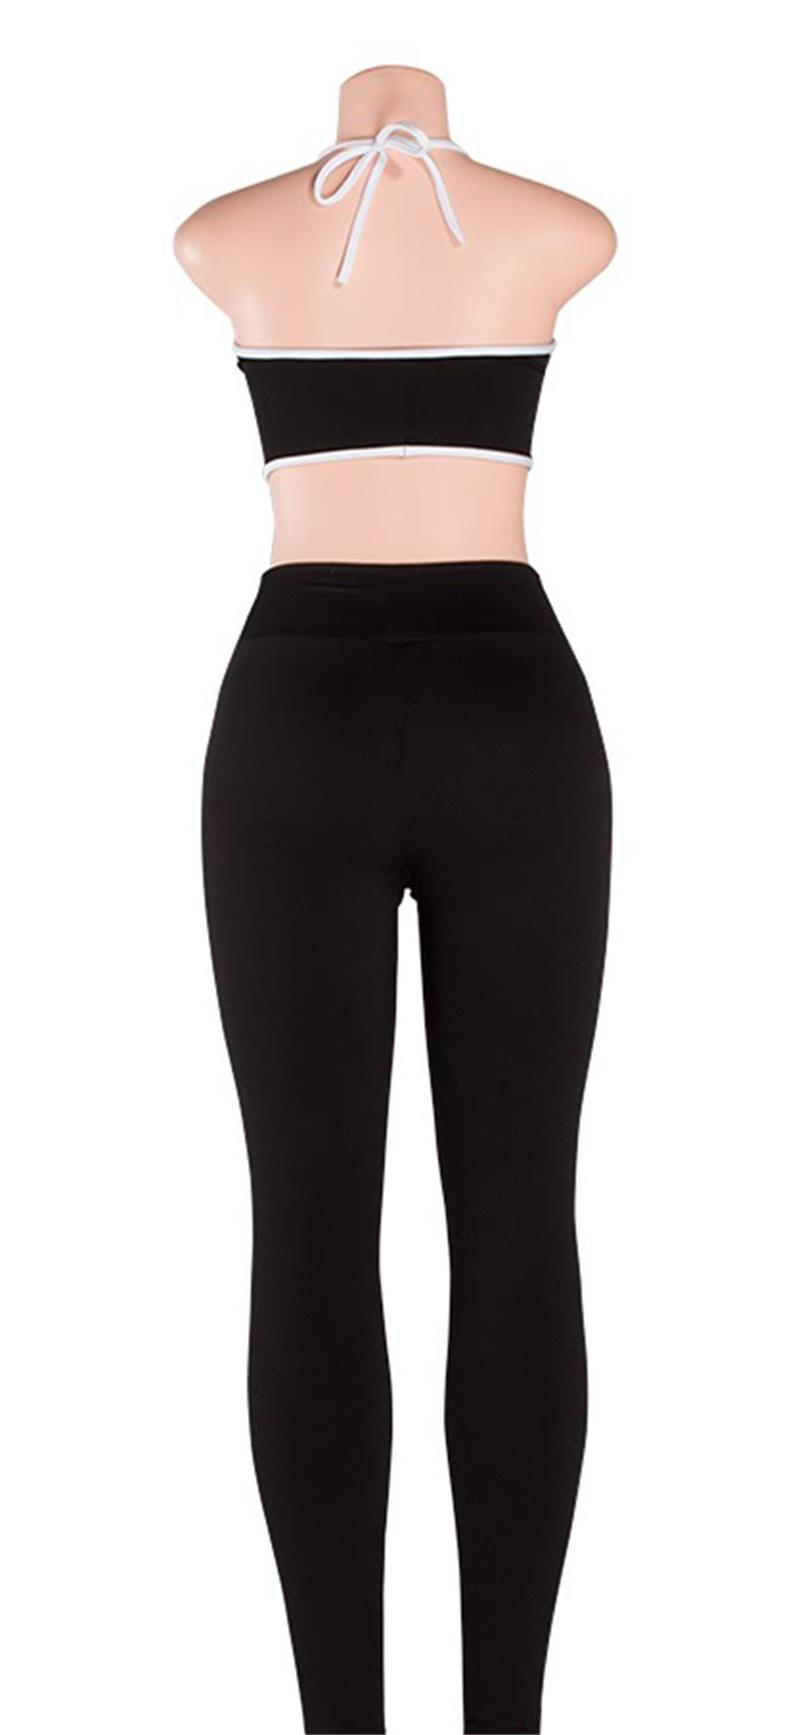 f3f979af13c22 Ceremokiss 2Pcs Women Yoga Sets Fitness Halter Bra+Pants Leggings ...